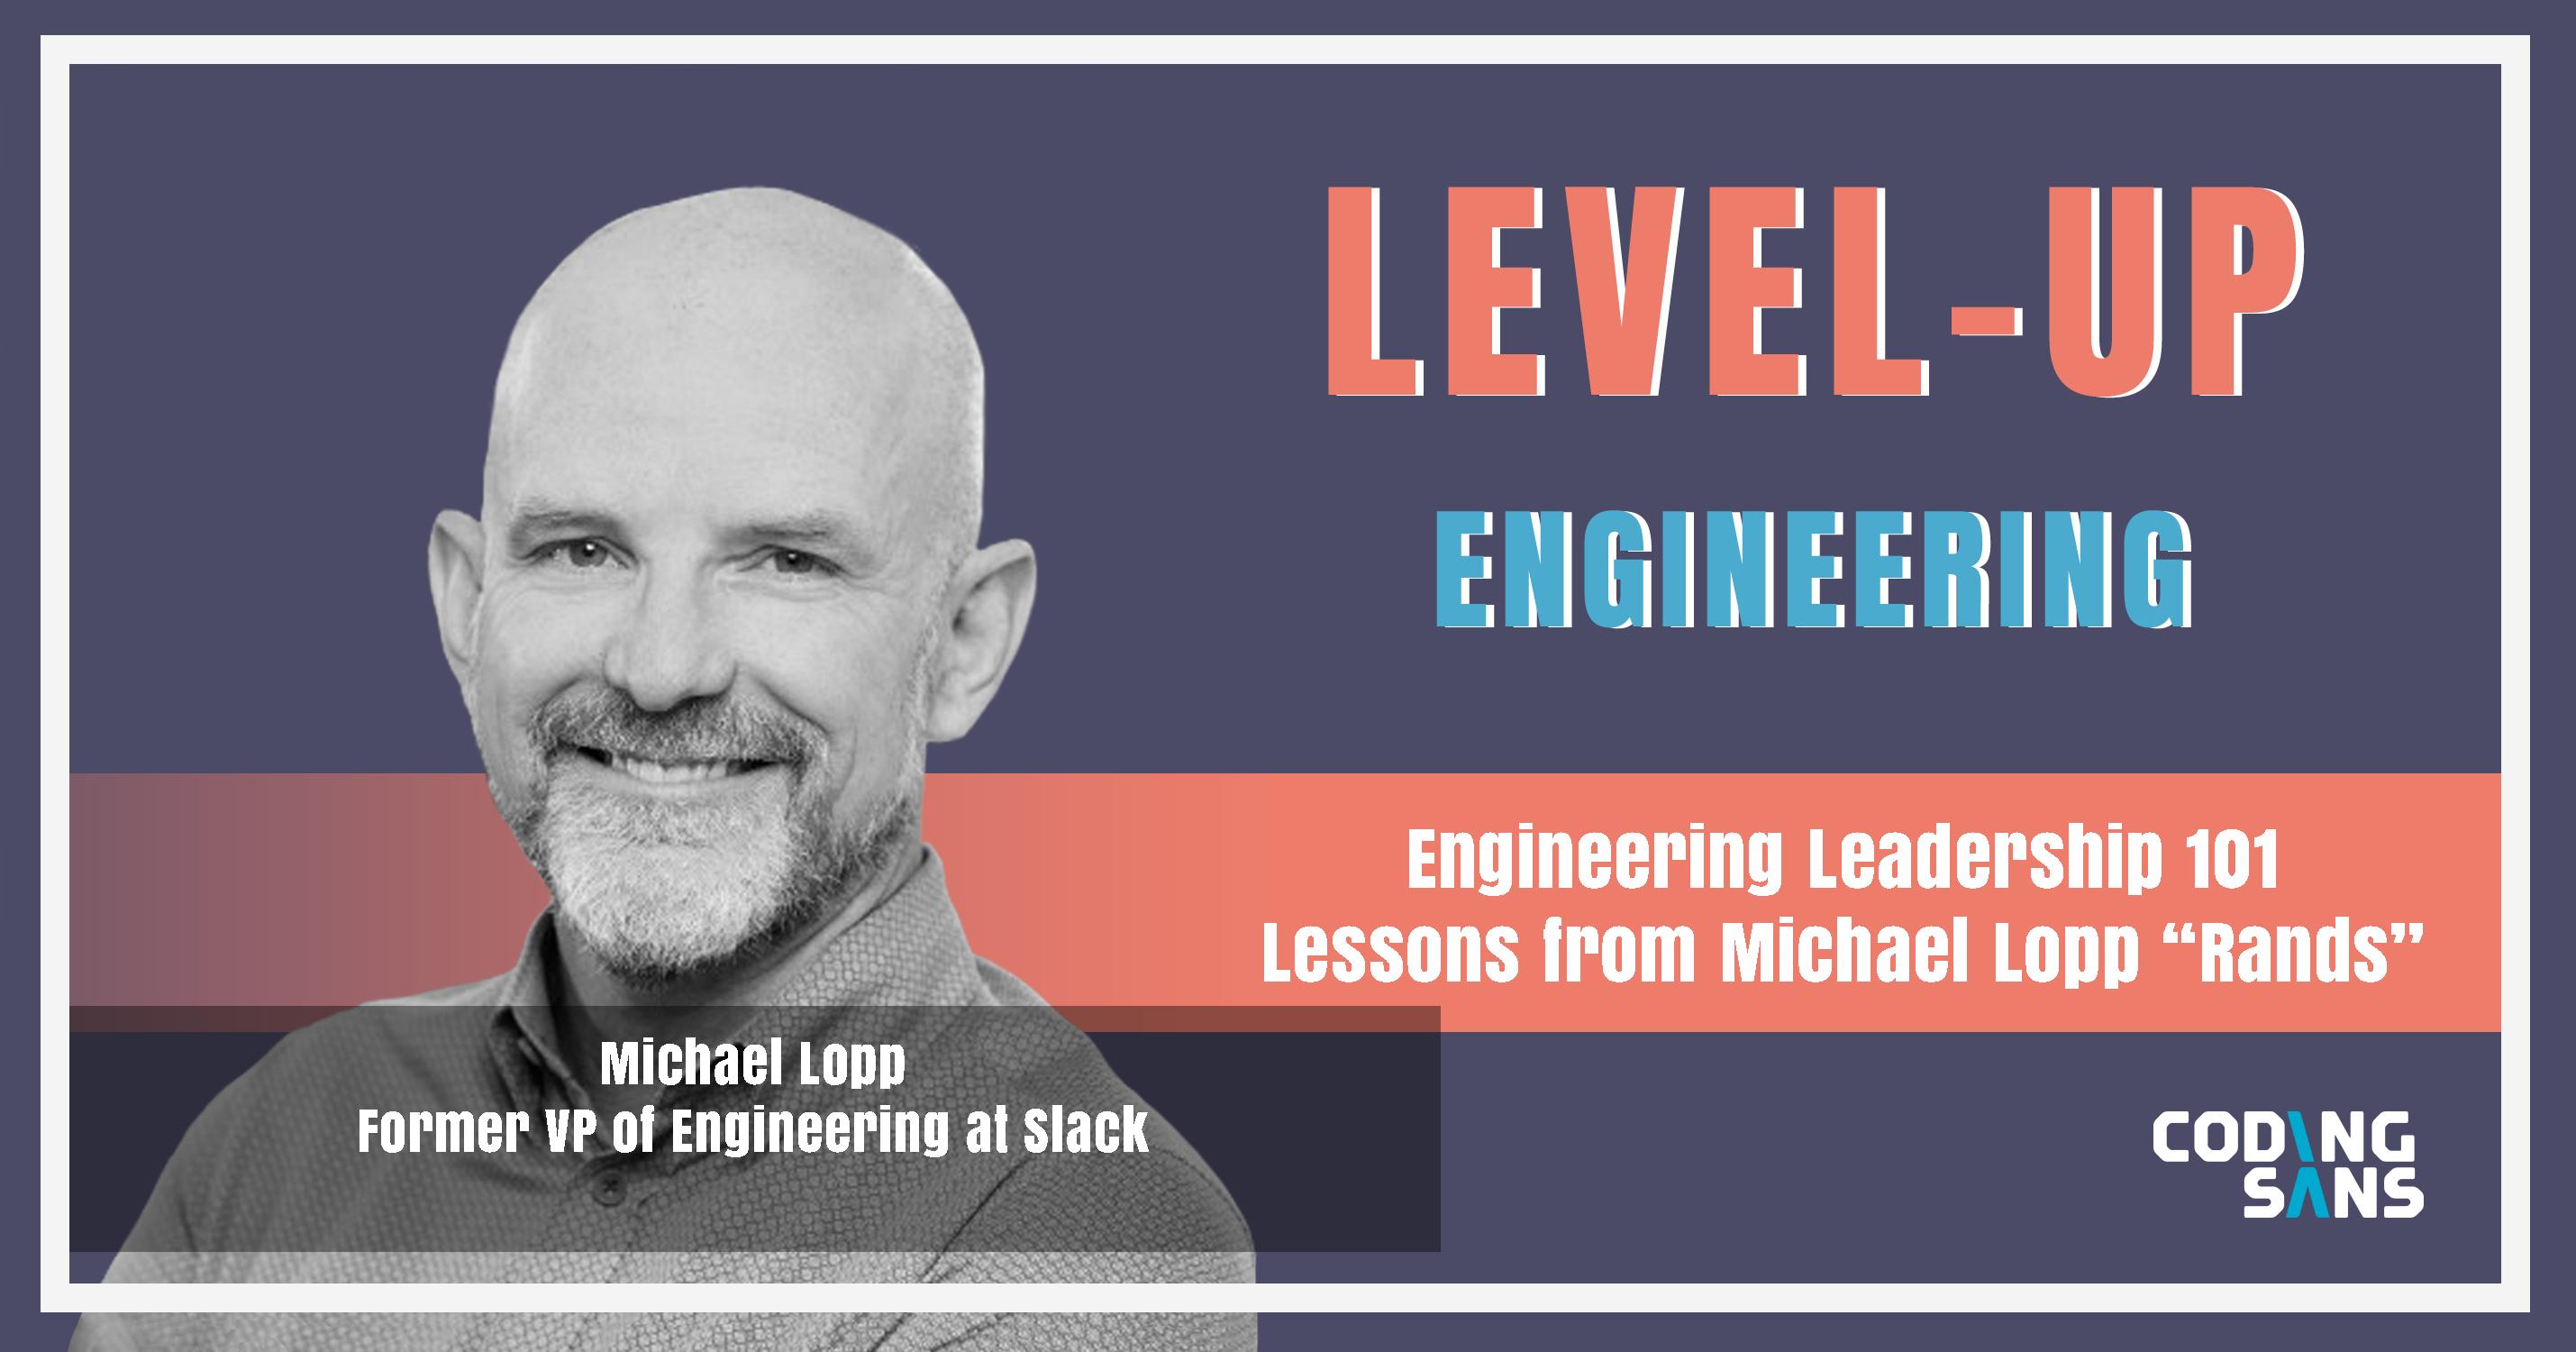 Engineering Leadership Podcast Michael Lopp Rands Level Up Engineering